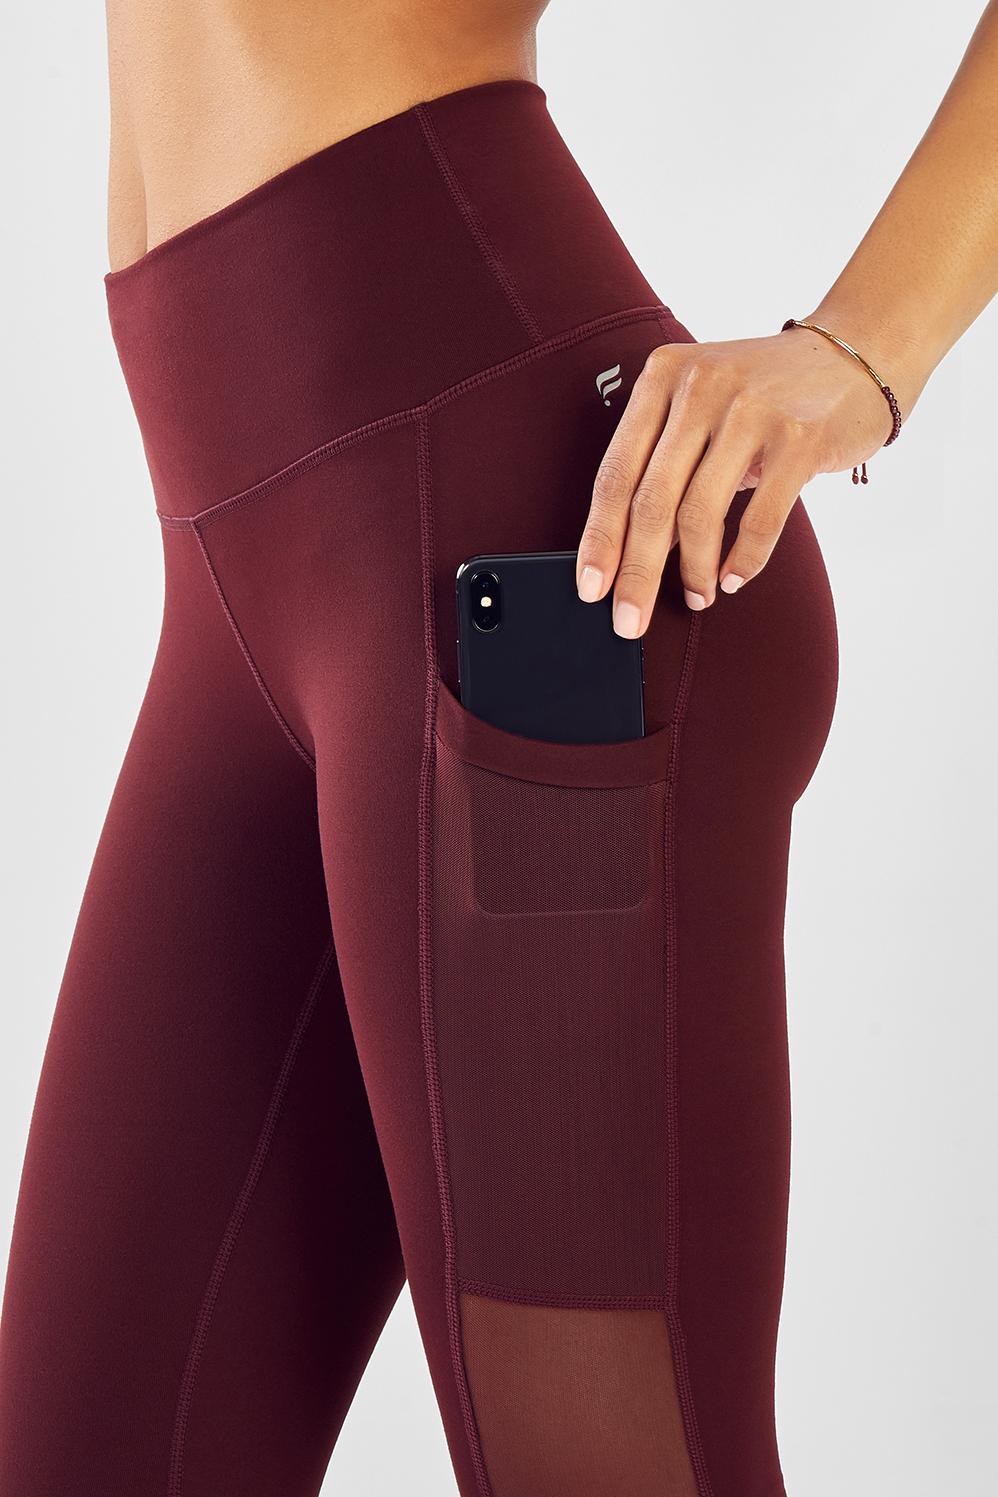 b1db409320241 Mila Pocket Legging - Fabletics